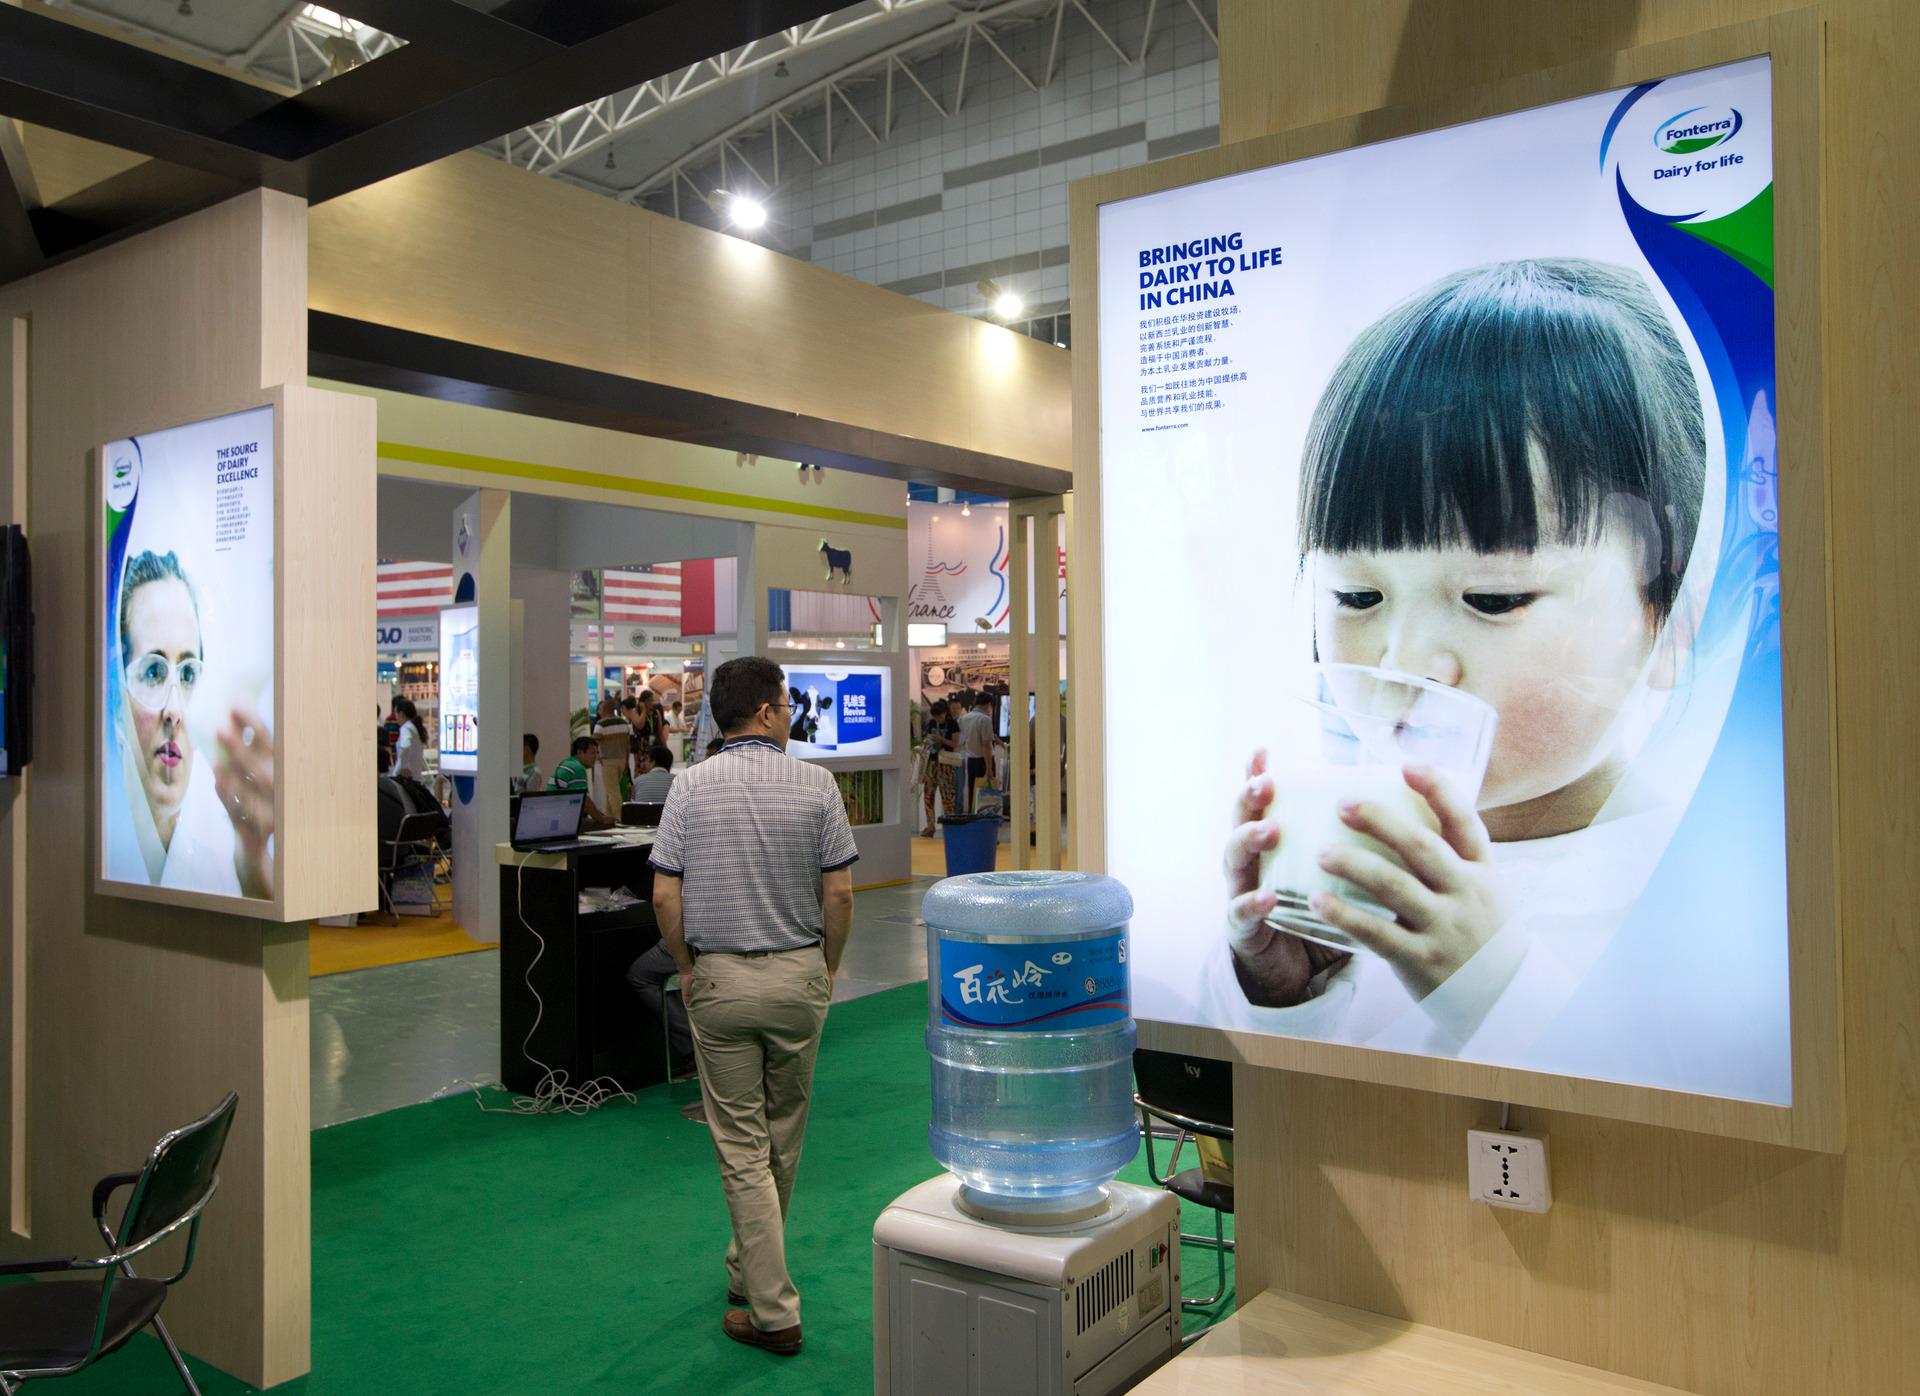 Exports to China still growing strong despite trade war